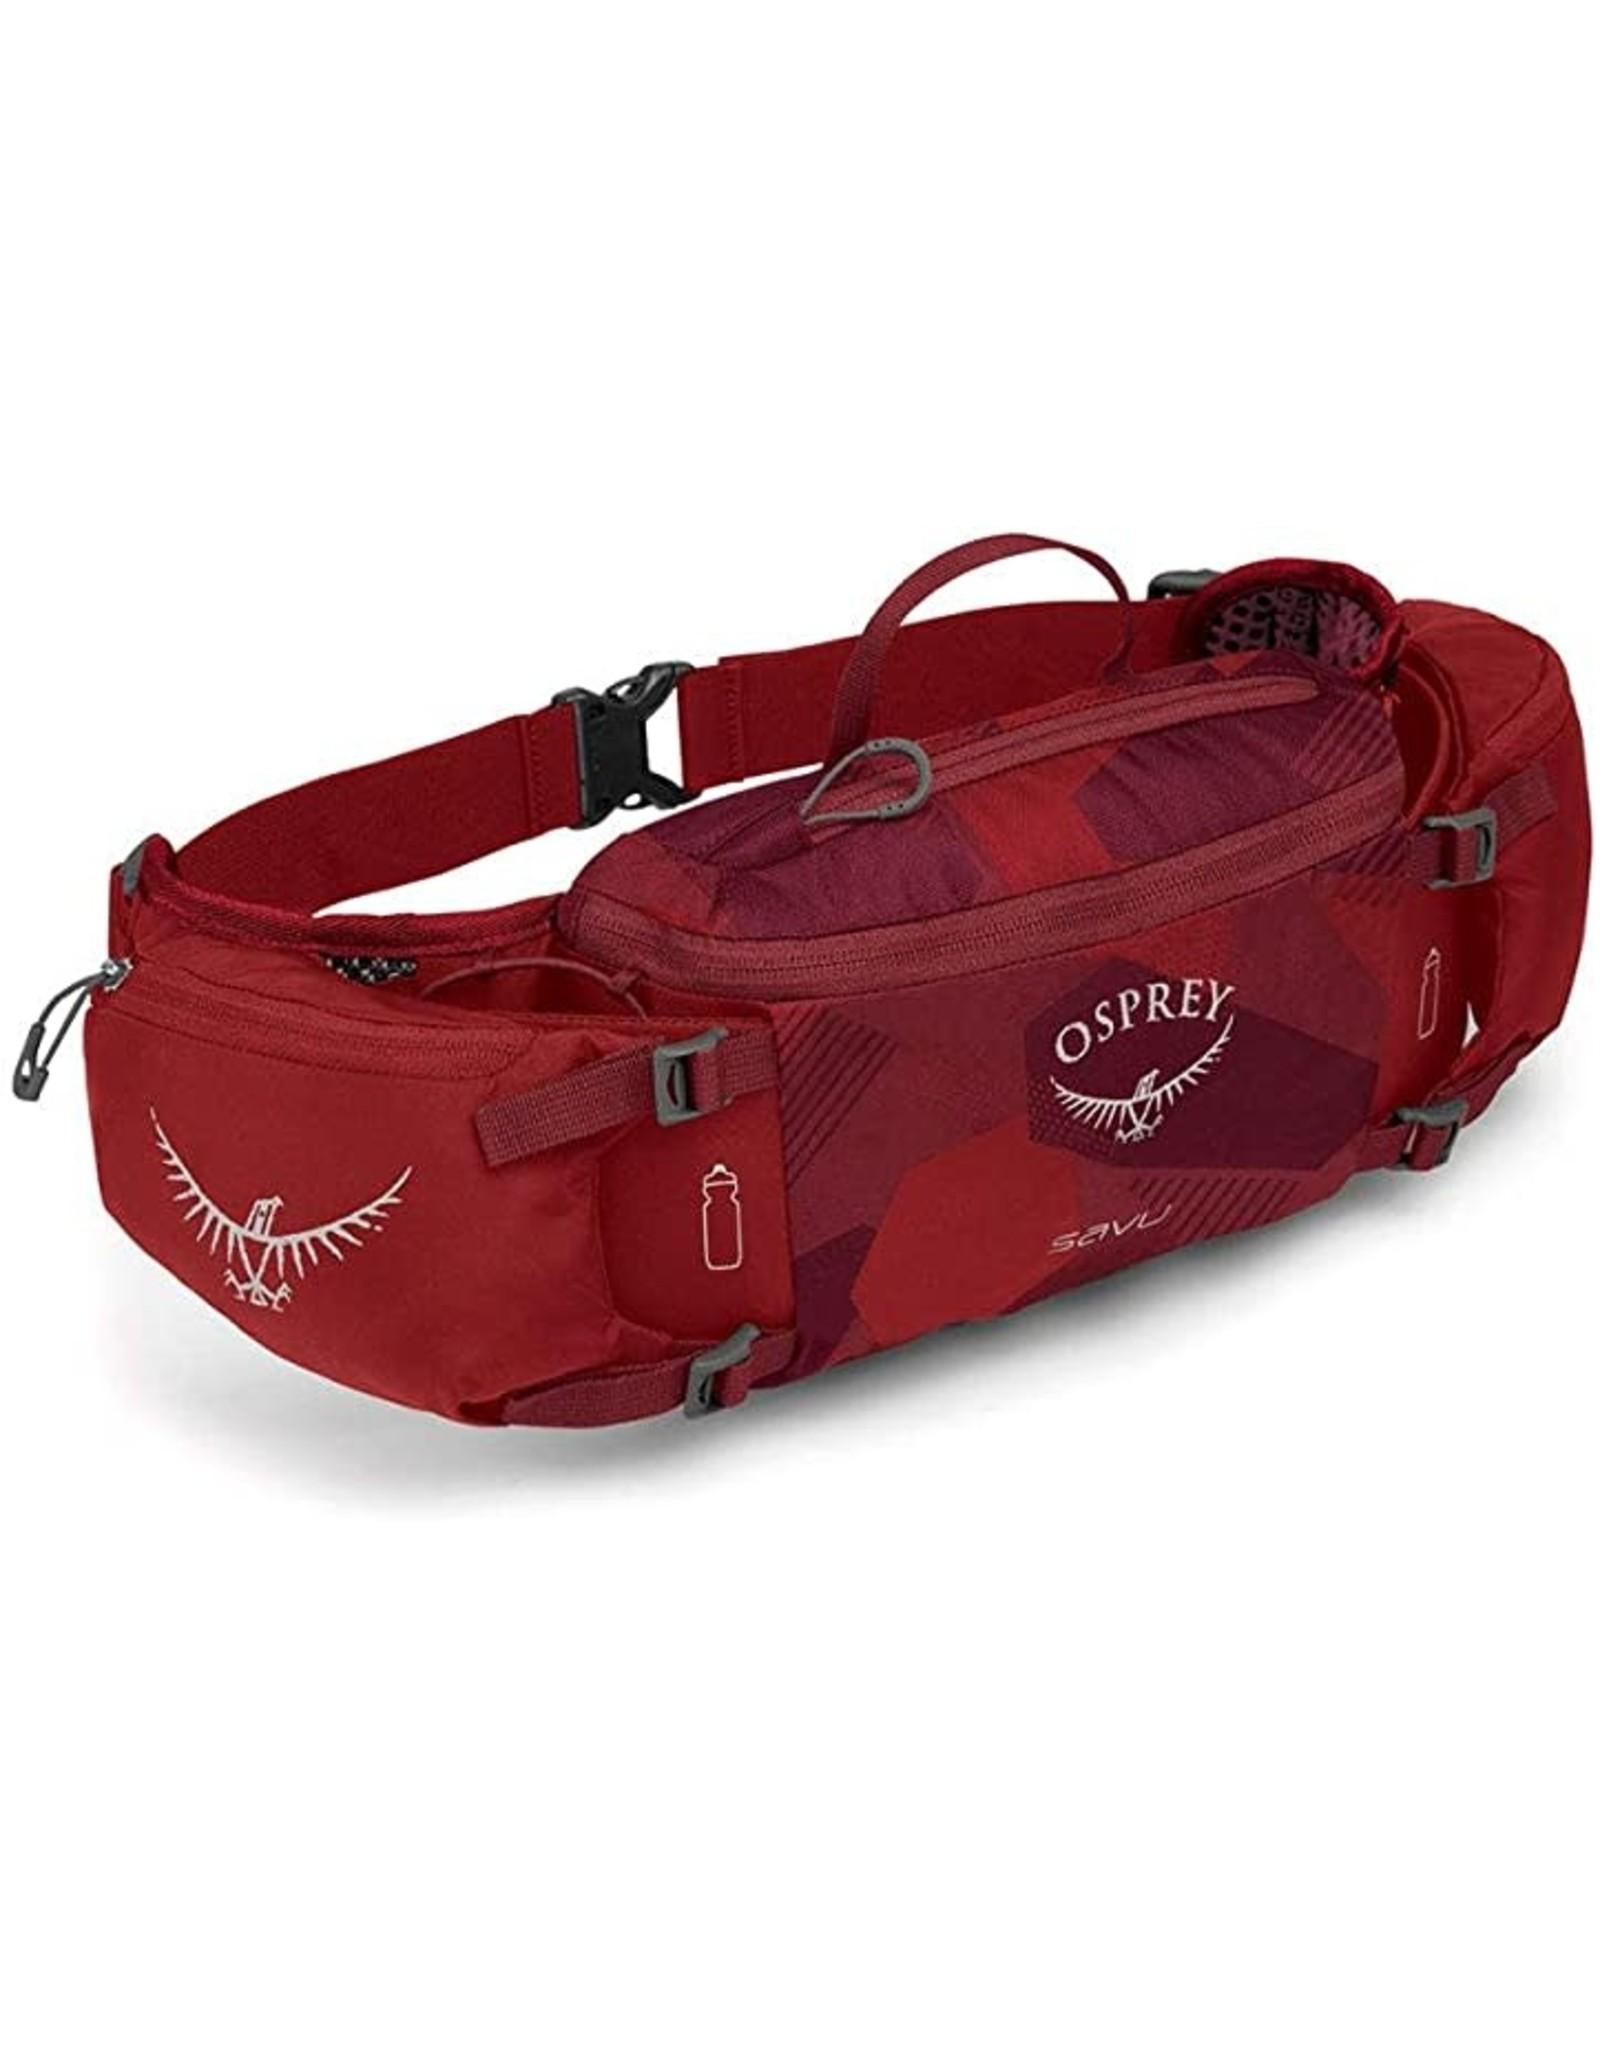 Osprey Osprey Savu Lumbar Bottle Pack: Molten Red, (Bottles Not Included)